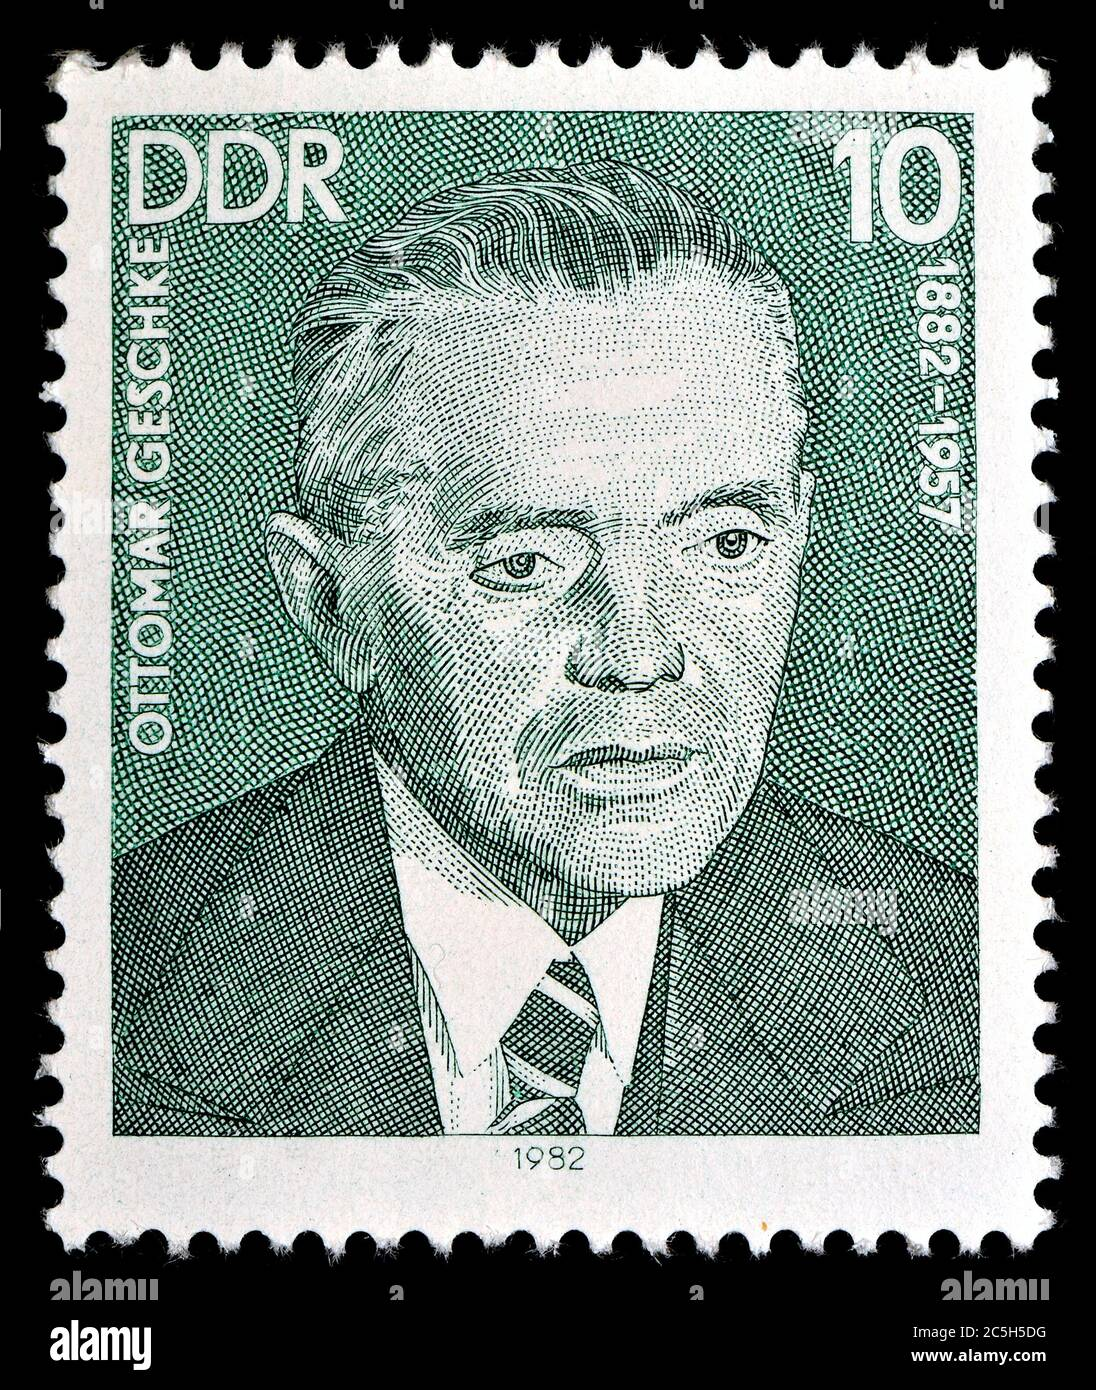 Timbre-poste est-allemand (1982) : Ottomar Georg Alexander Geschke (1882-1957) politicien allemand (KPD, SED). Banque D'Images